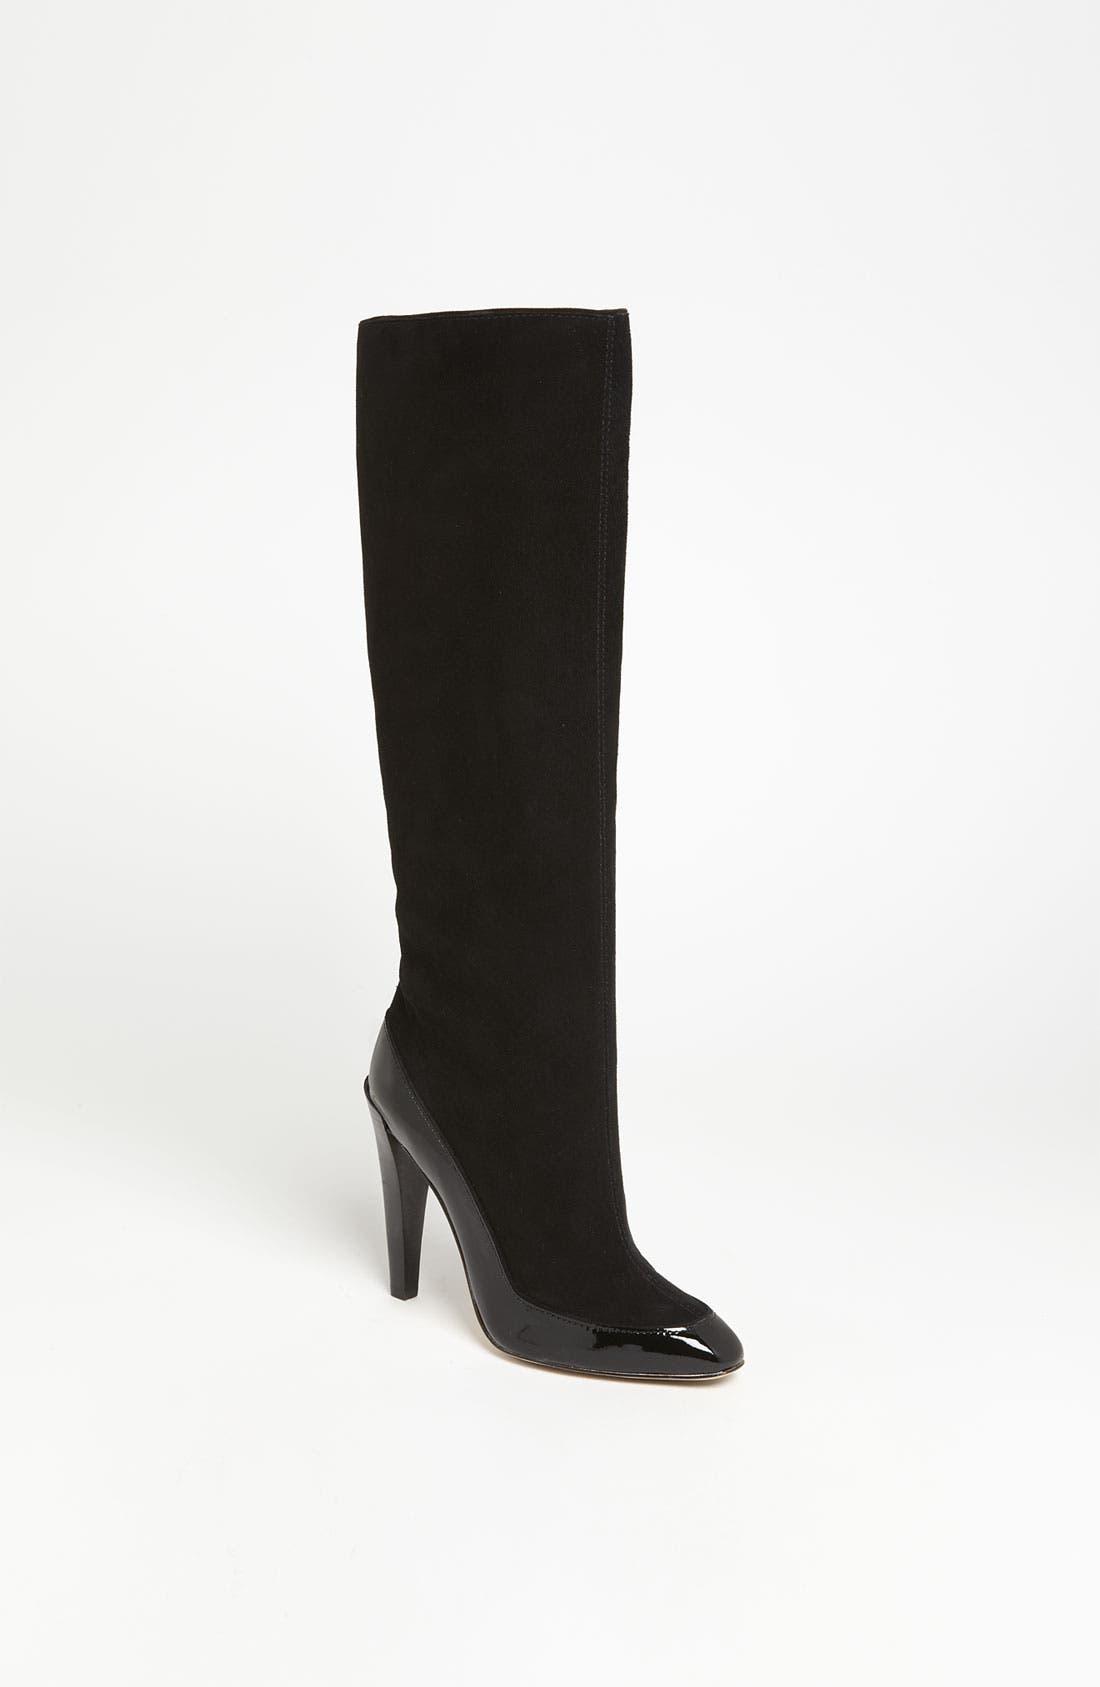 Alternate Image 1 Selected - Diane von Furstenberg 'Dalad' Over the Knee Boot